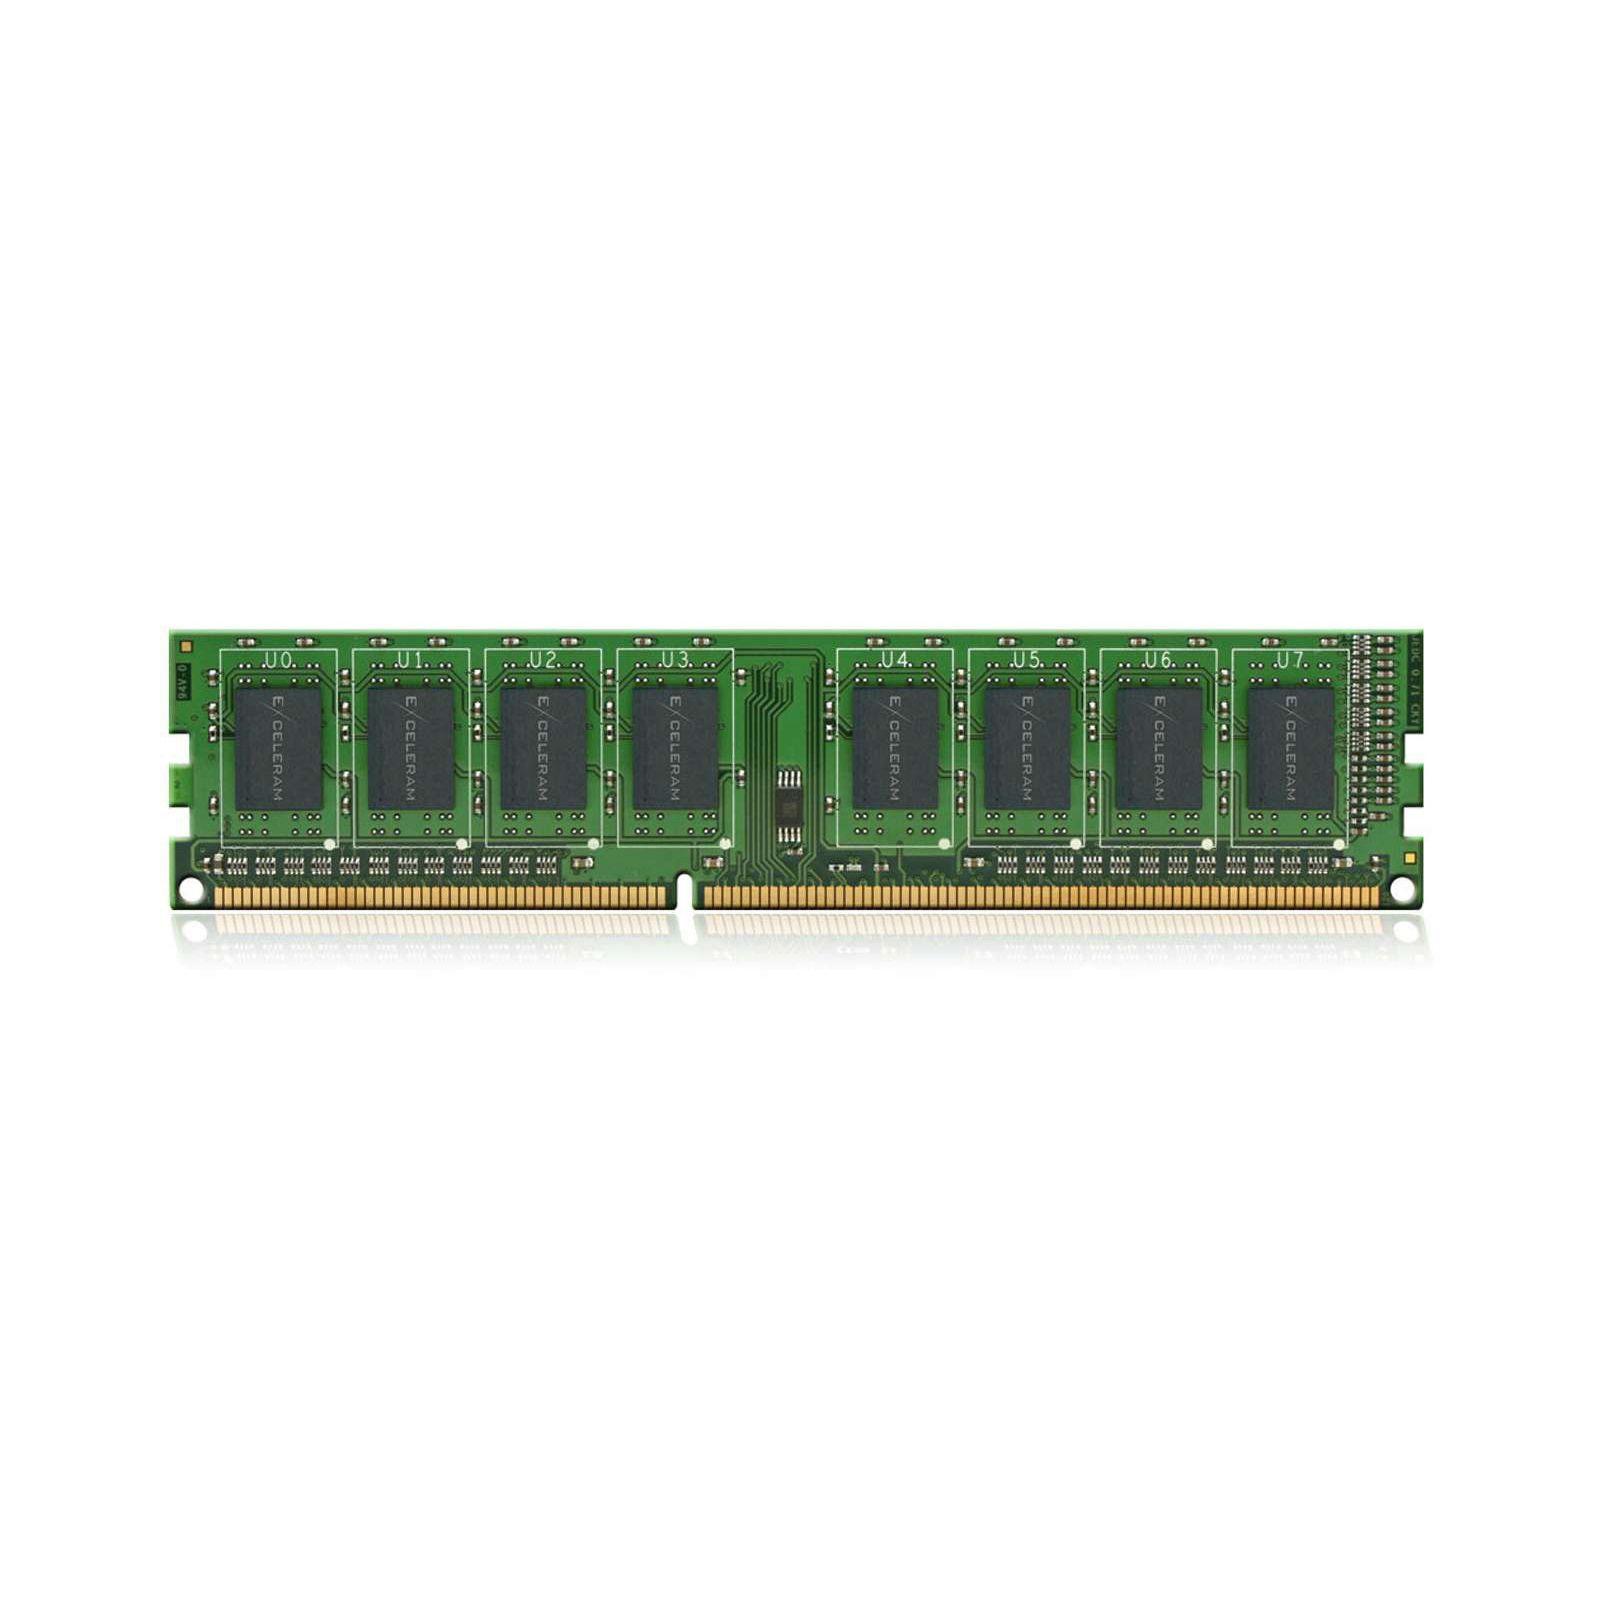 Модуль памяти для компьютера DDR3 2GB 1600 MHz Hynix (H5TC4G63CFR-PBA (2GB))